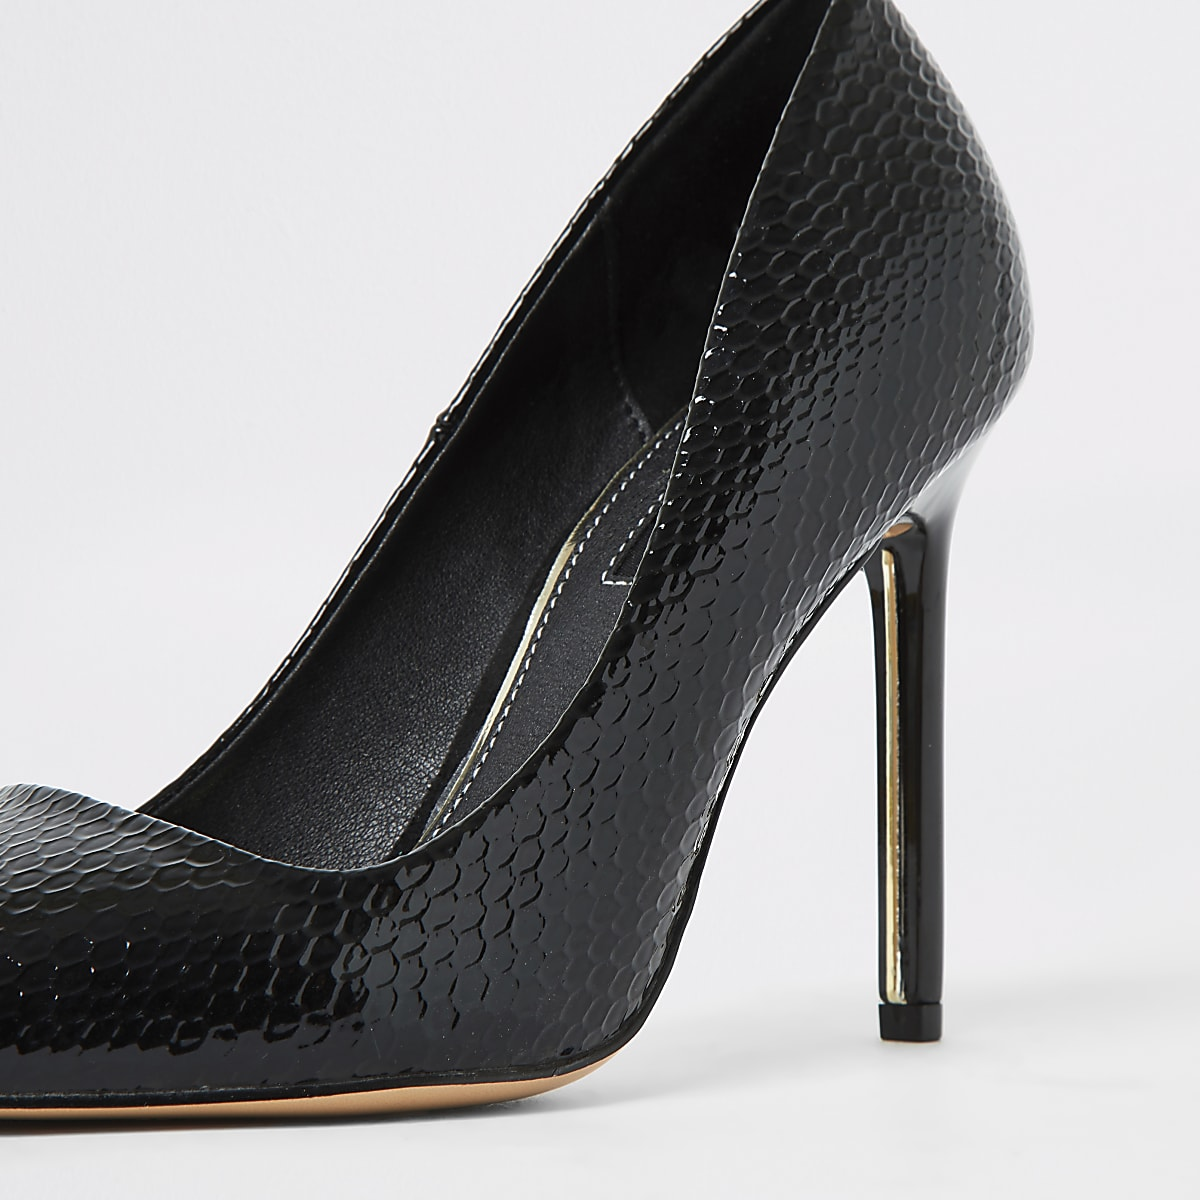 reputable site bbd9a 0f732 Black croc patent court shoes